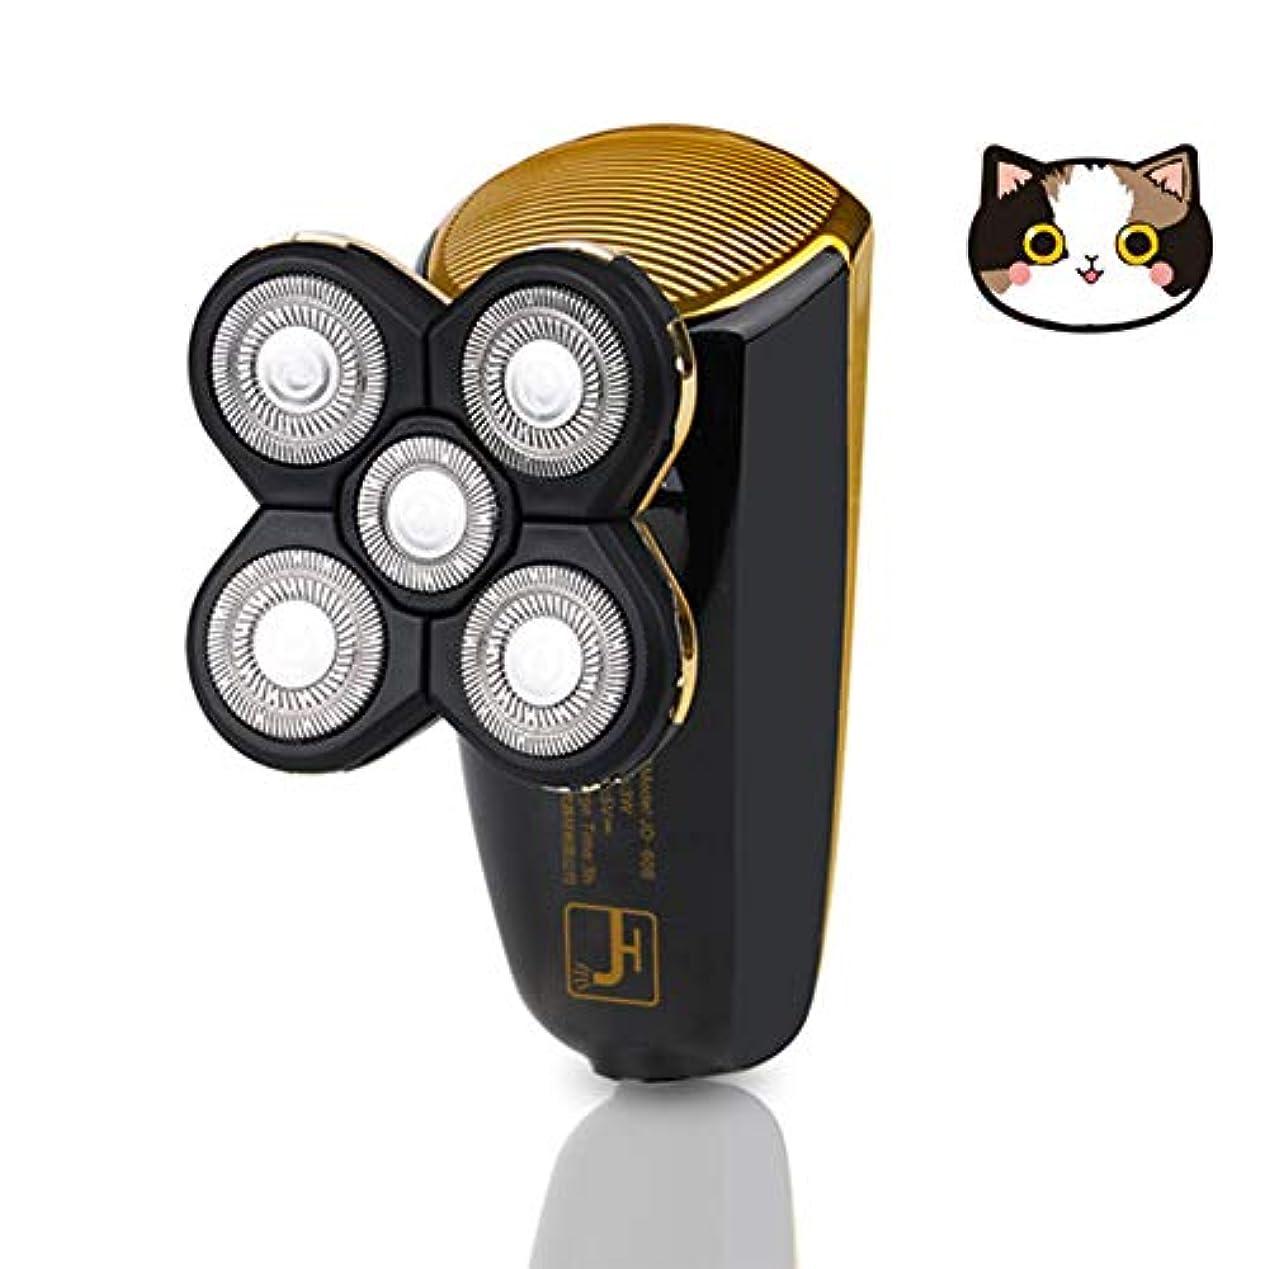 MACOLAUDER メンズシェーバー USB充電式 5枚刃 回転式ヘッド 電気 WET&DRY シェーバー ヒゲソリ IPX6級防水 お風呂剃り&丸洗い可 男性用 ミニ鏡付 ゴールド